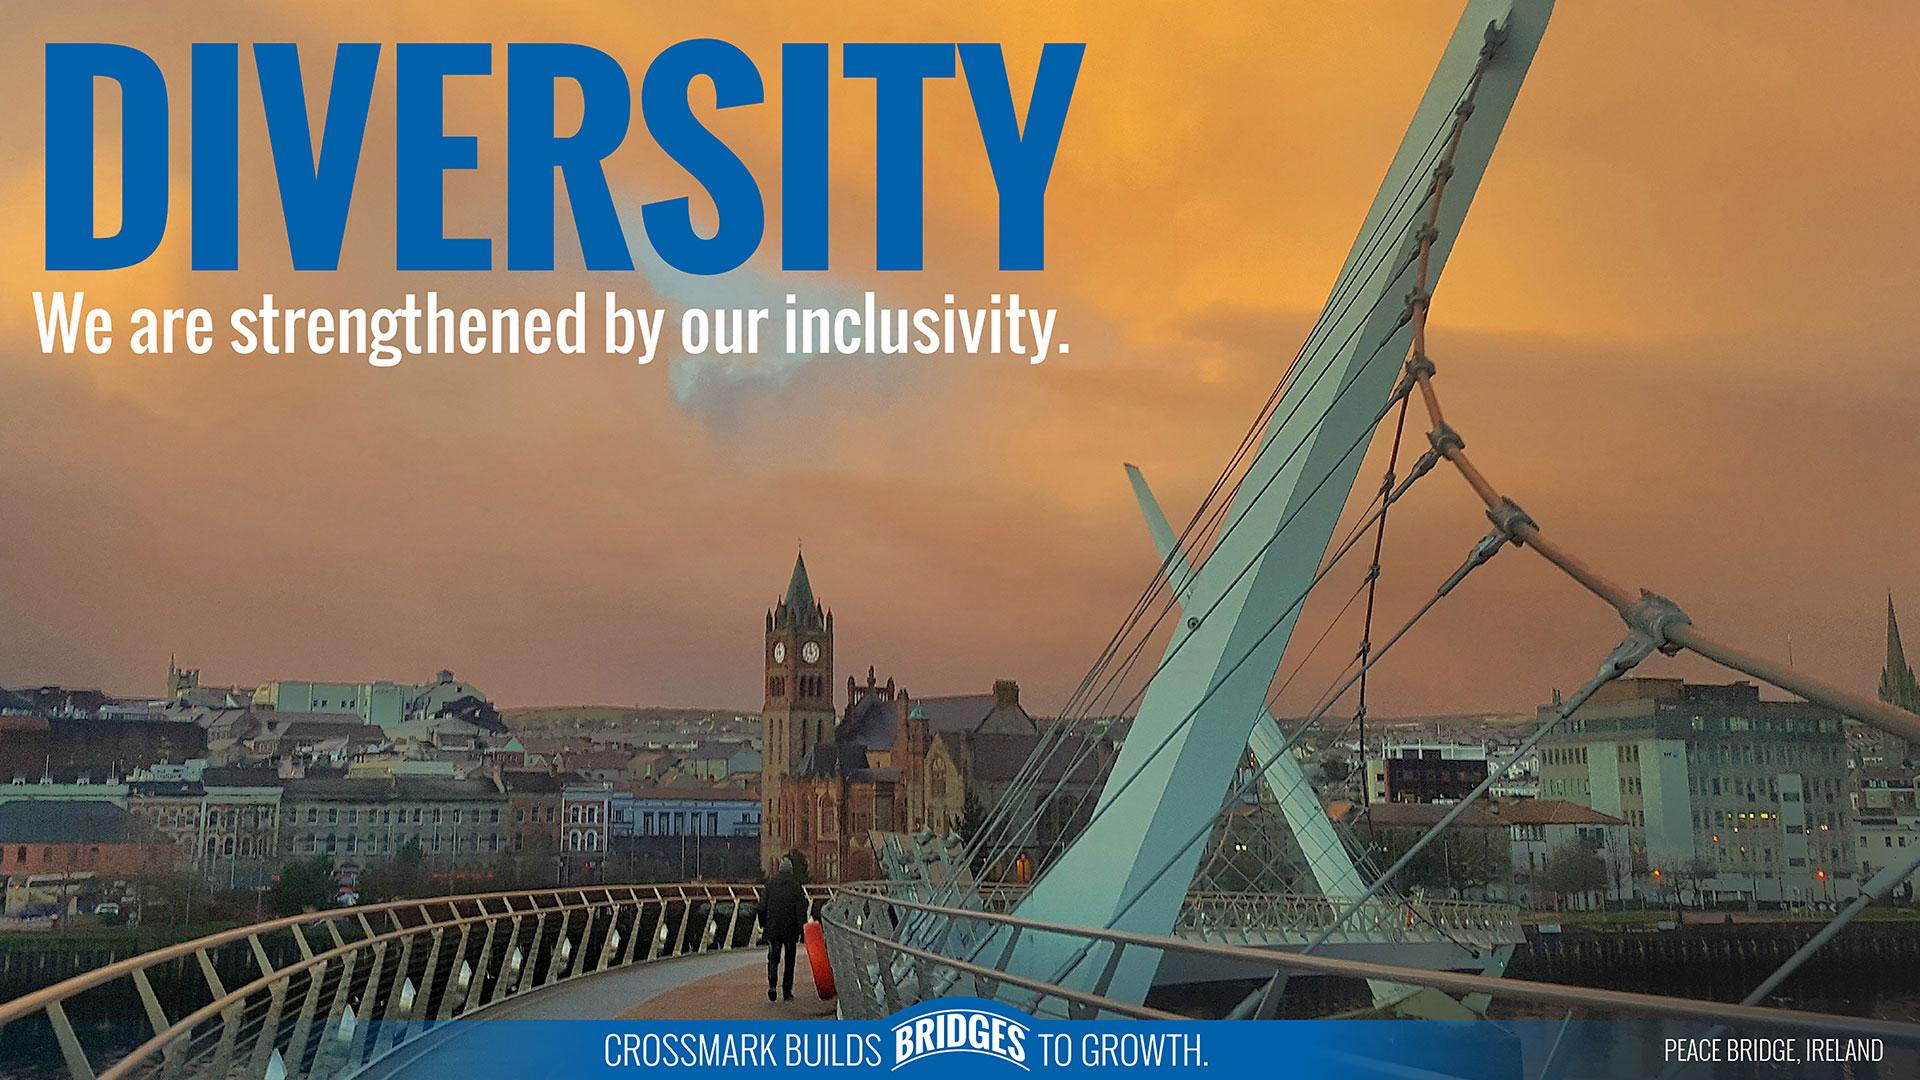 CROSSMARK Builds Bridges to Growth by diversity